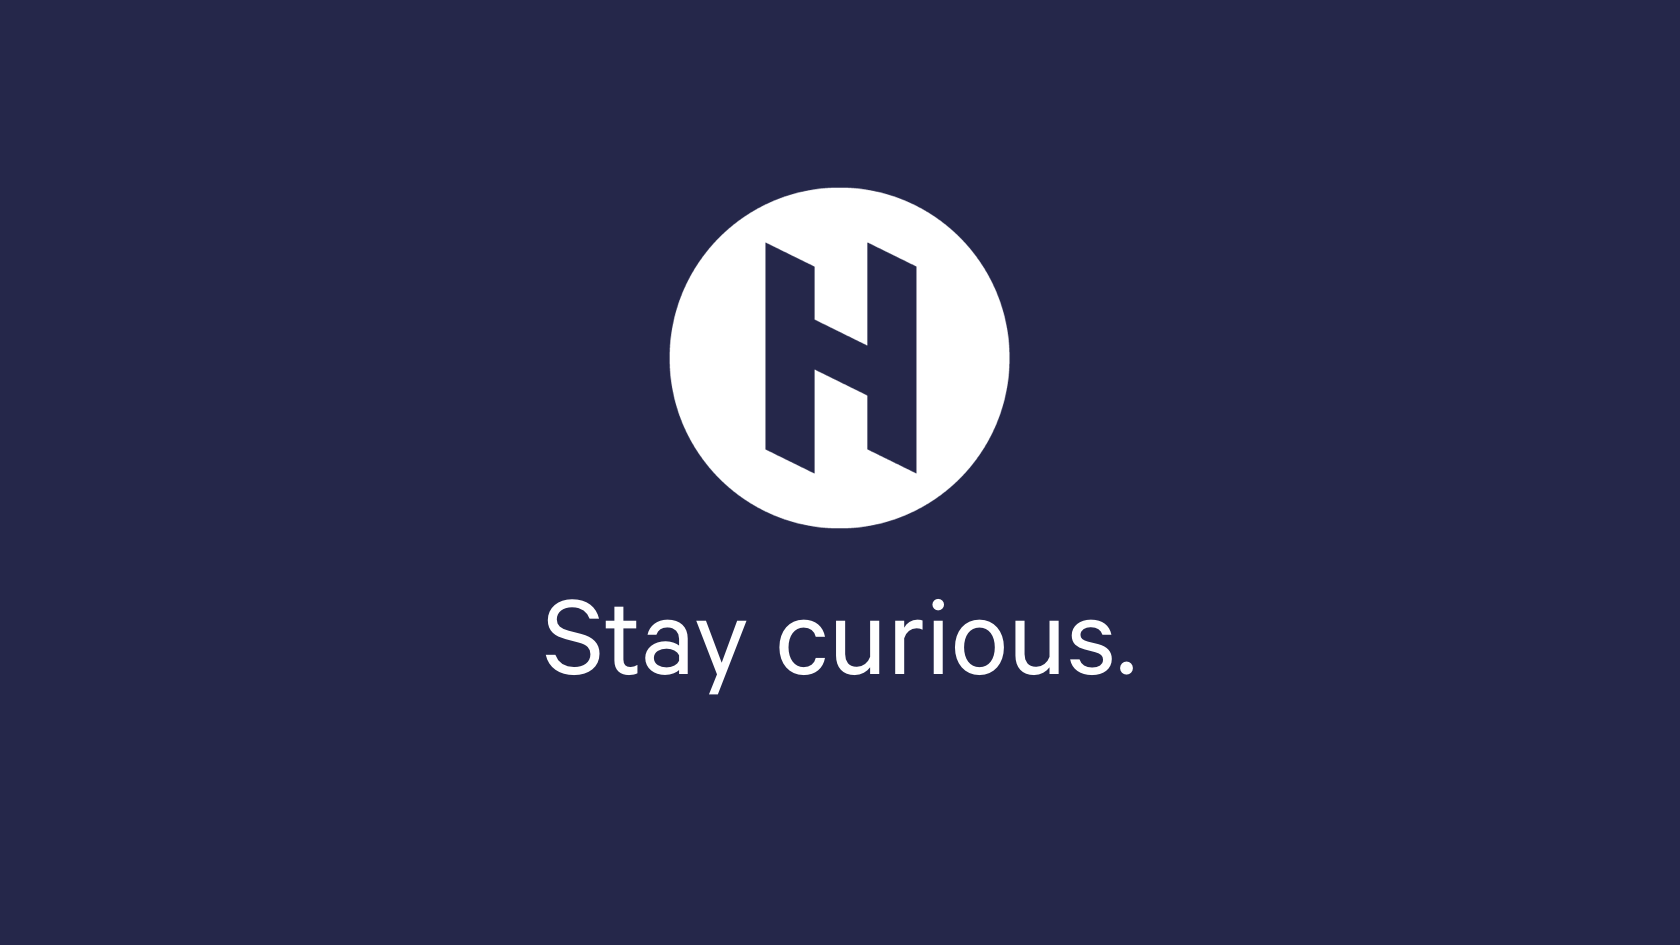 hypr_stay curious